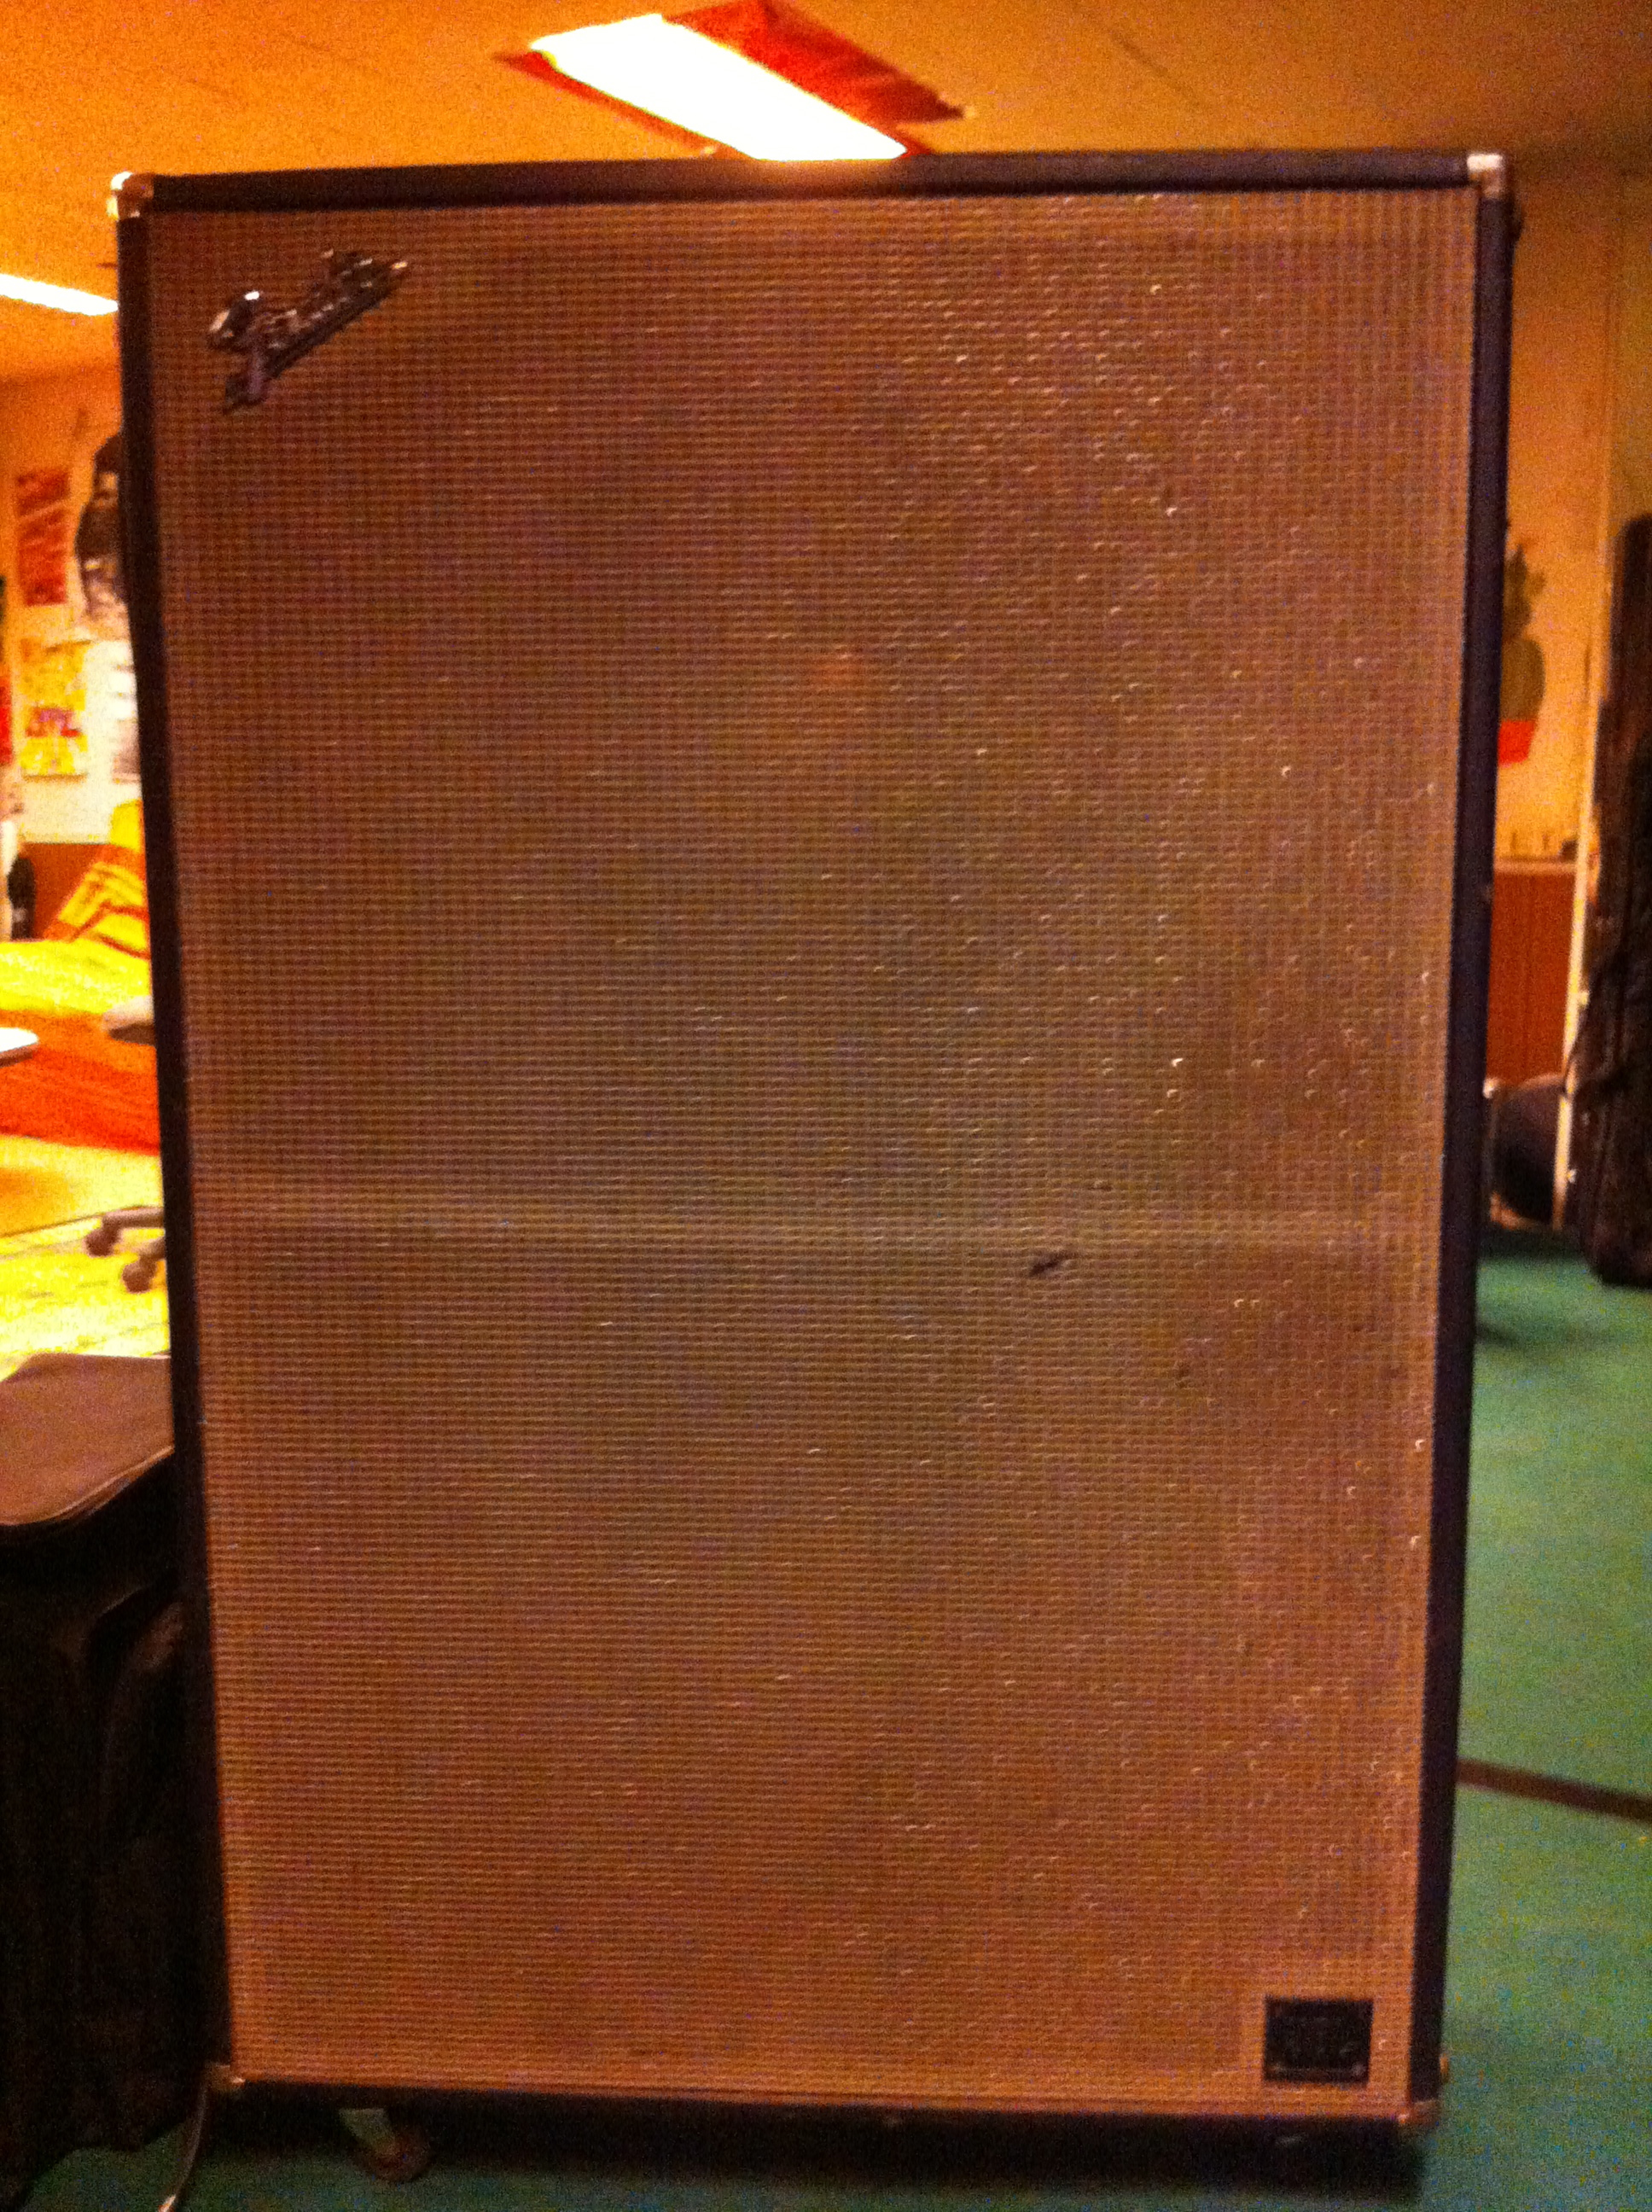 so time cab board fender pro gearslutz with guitars many bassman bassmanhead community audio cabinet little